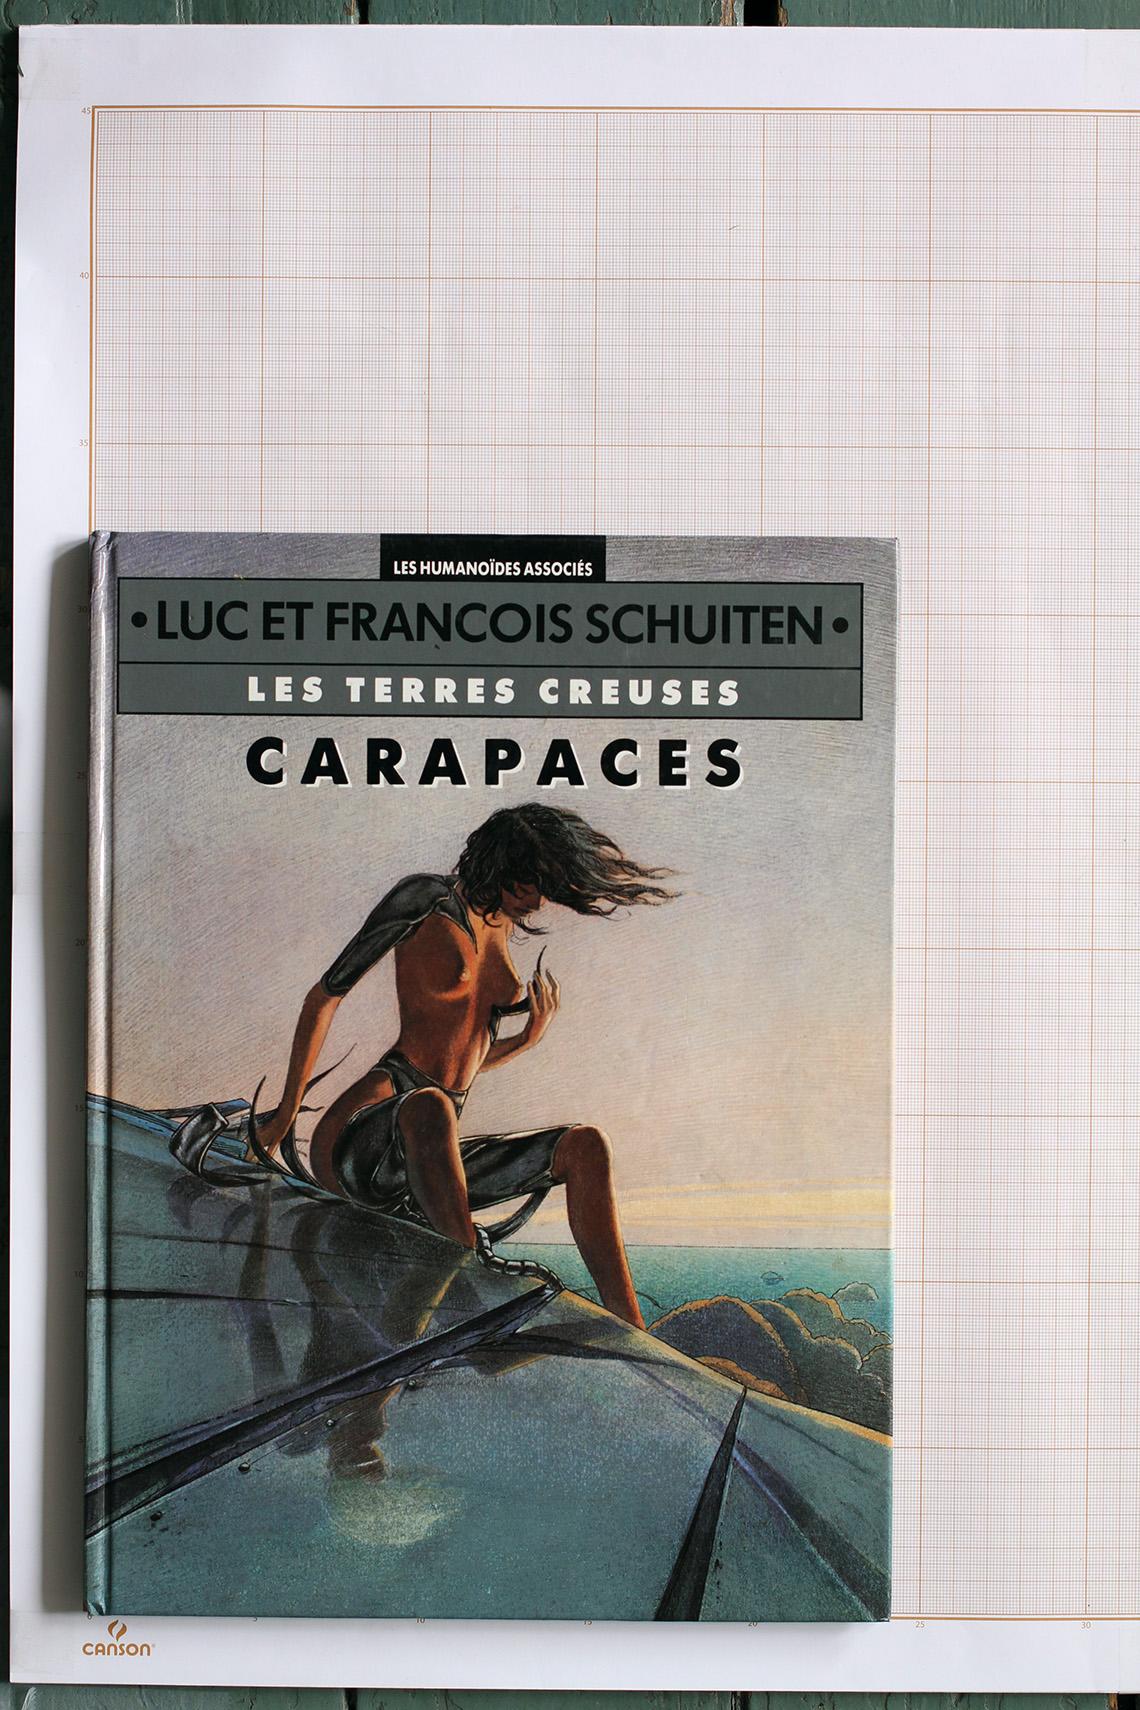 Carapaces, F.Schuiten & L.Schuiten - Humanoïdes Associés© Schuiten, 1994